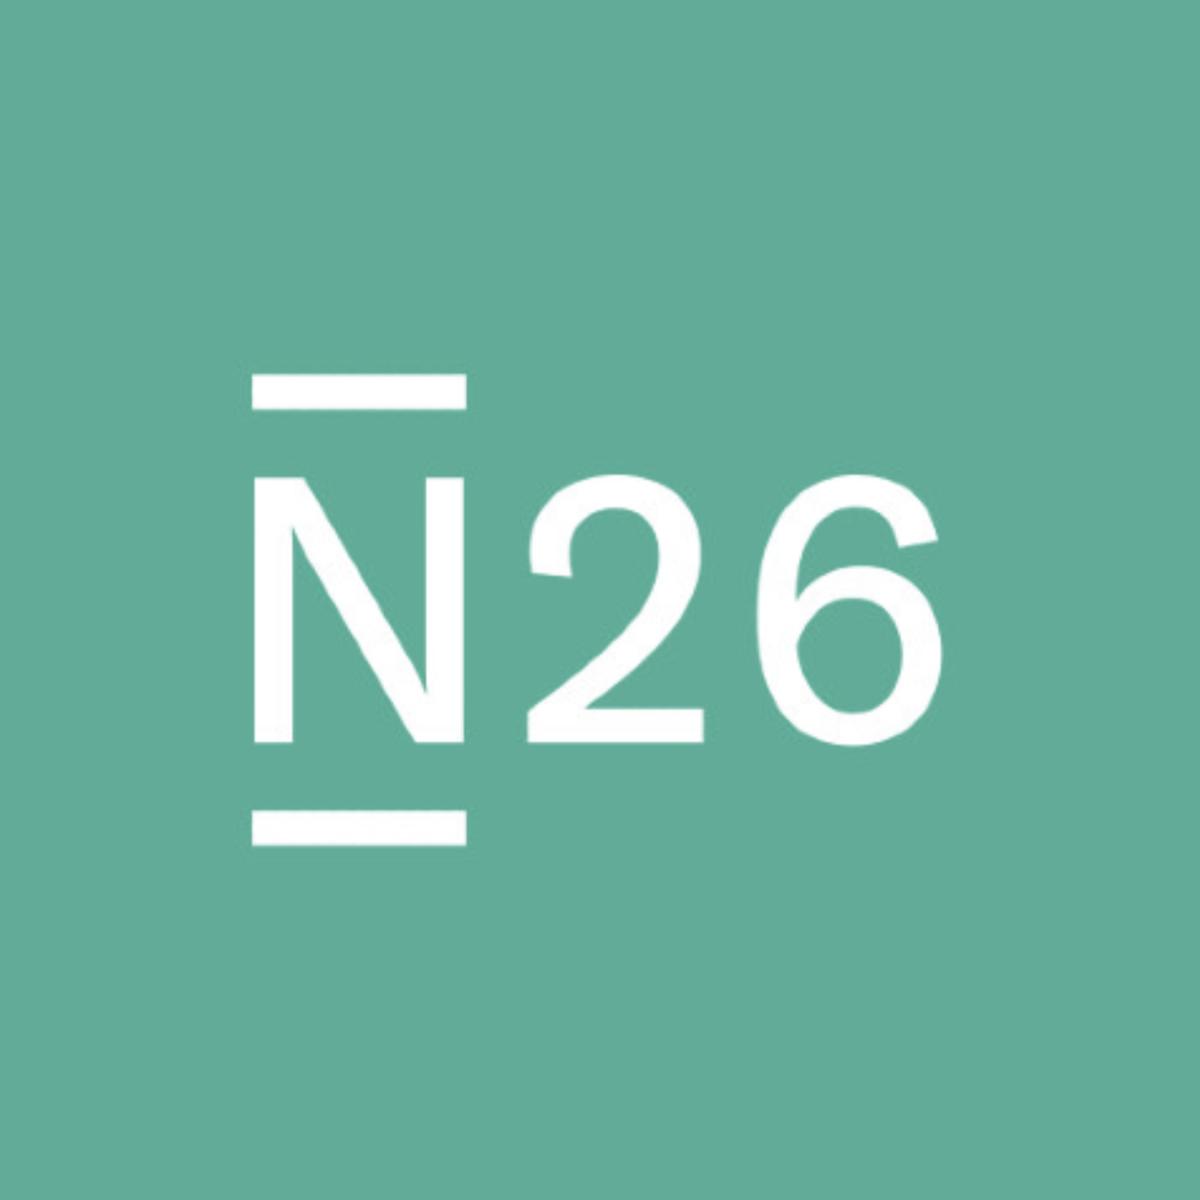 N26 Bank Logo @ Savings4Freedom